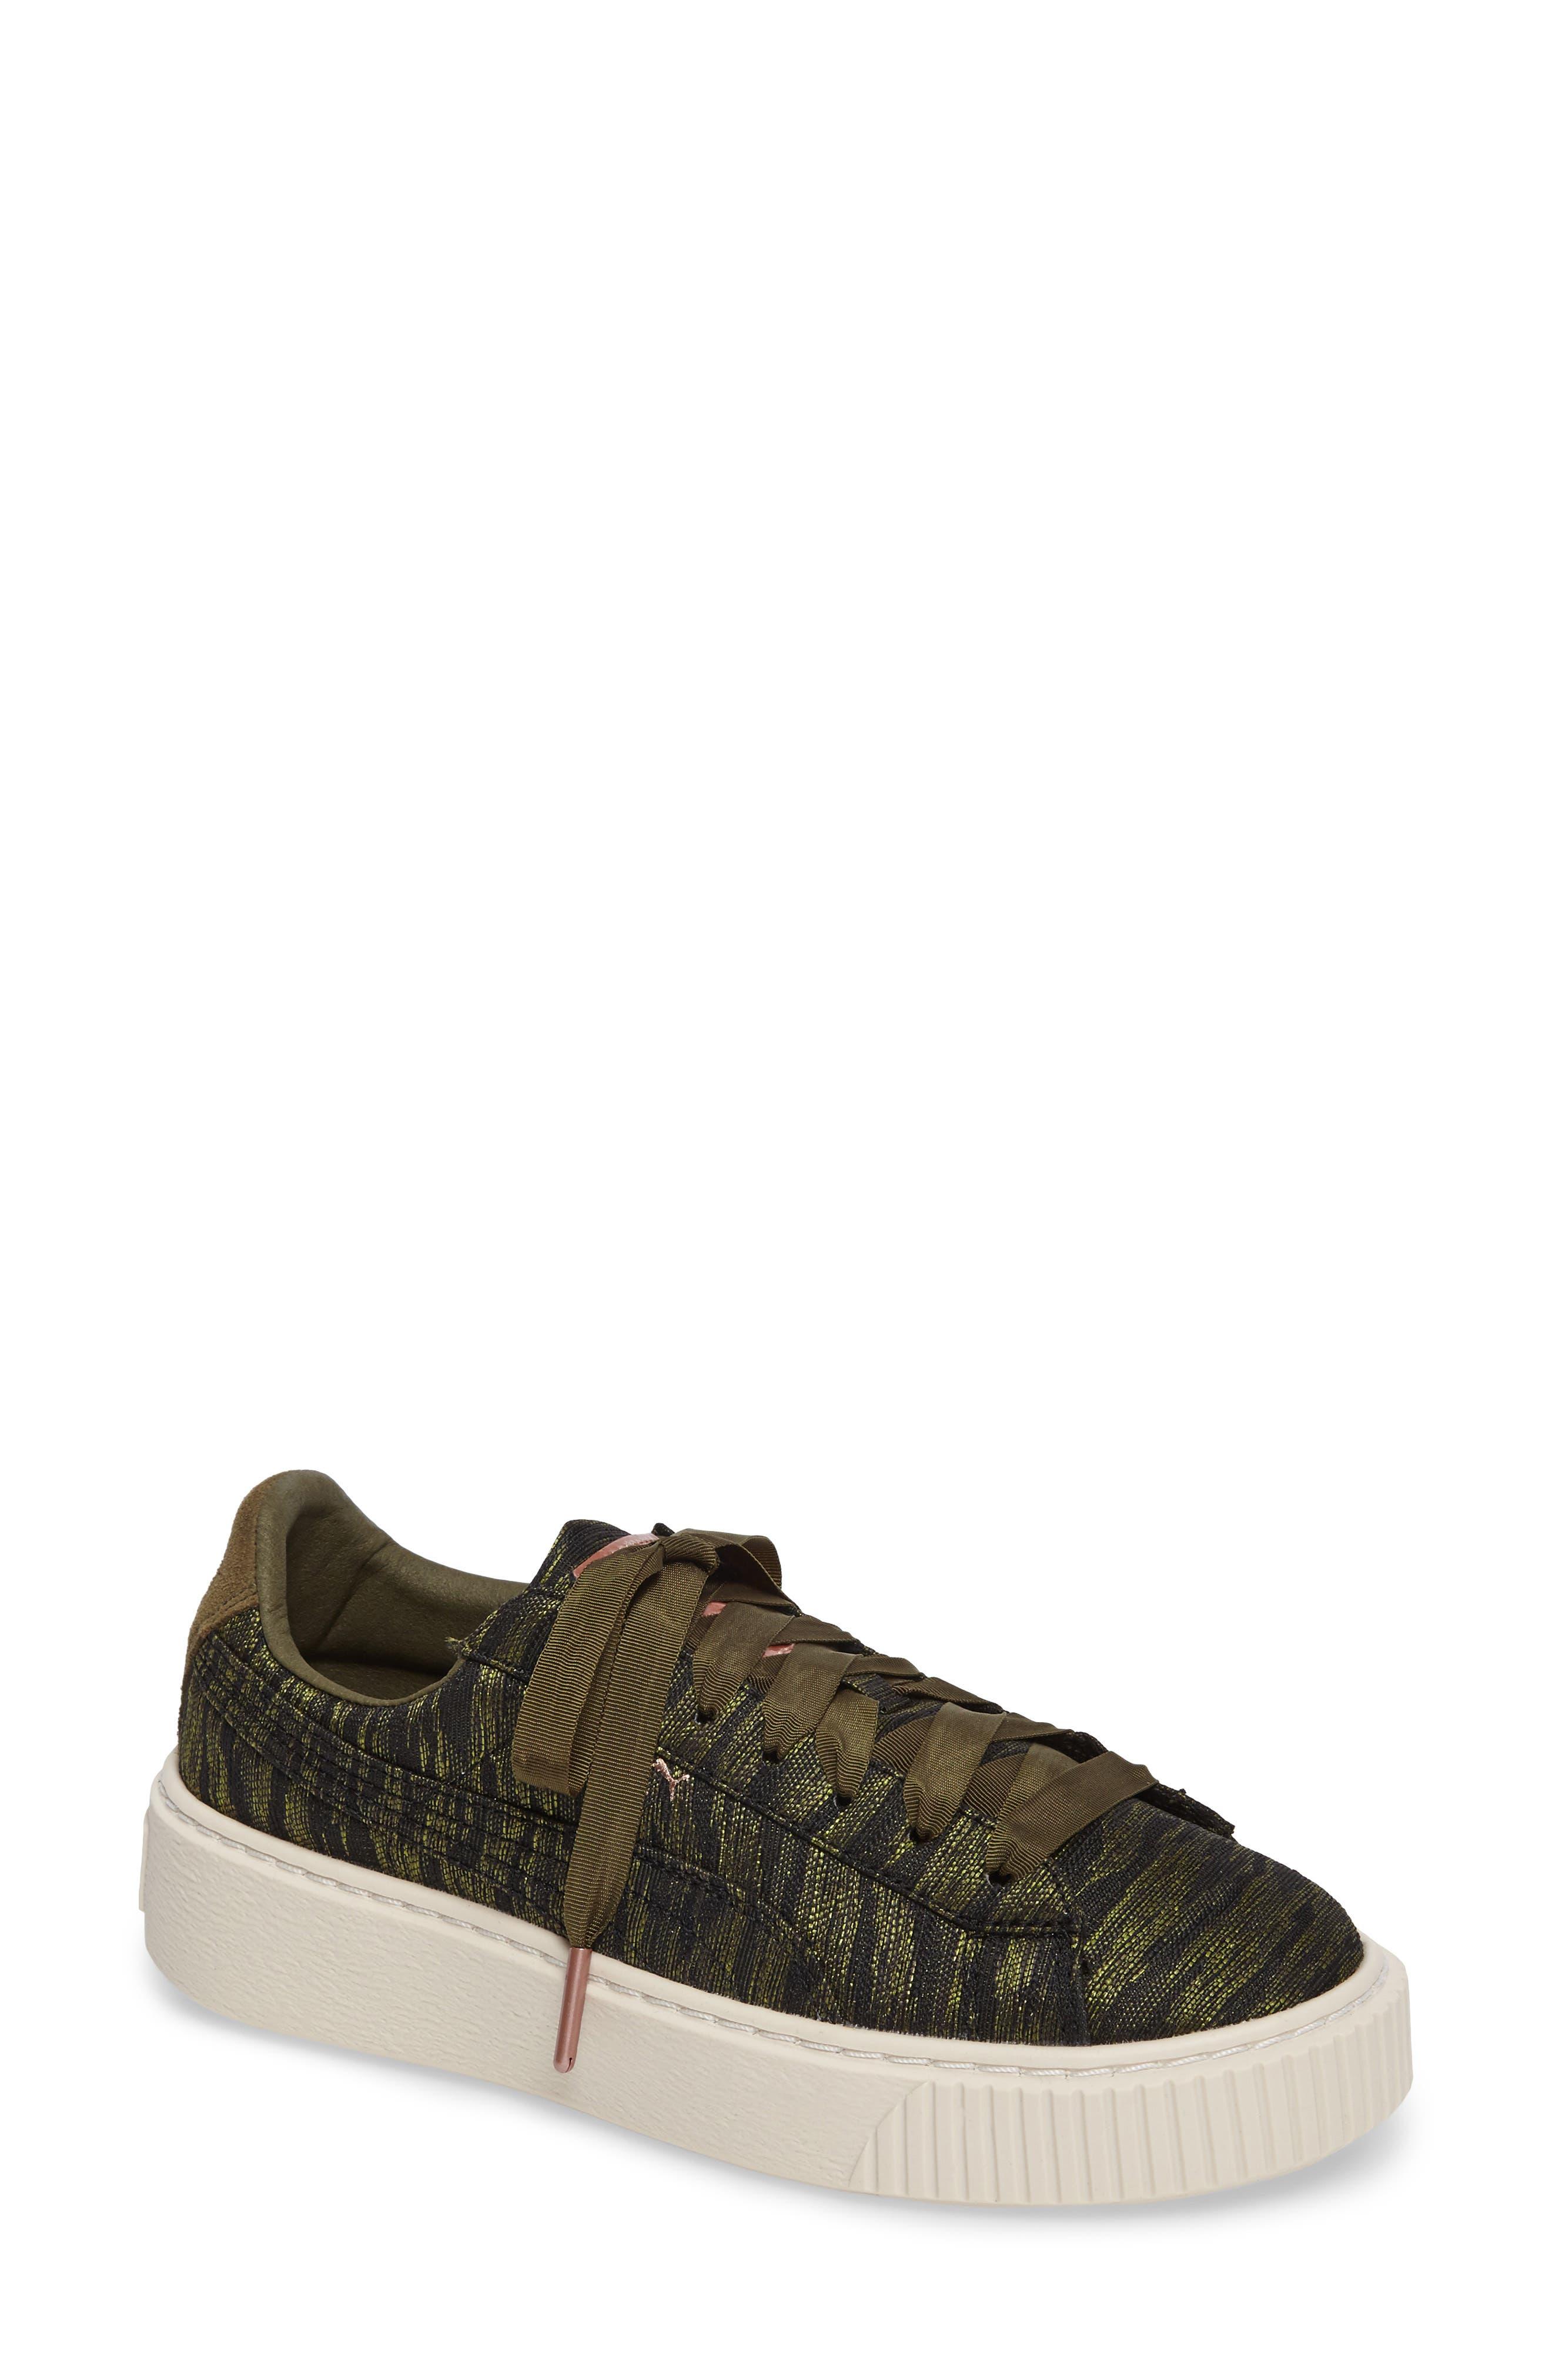 Alternate Image 1 Selected - PUMA Basket Platform Sneaker (Women)